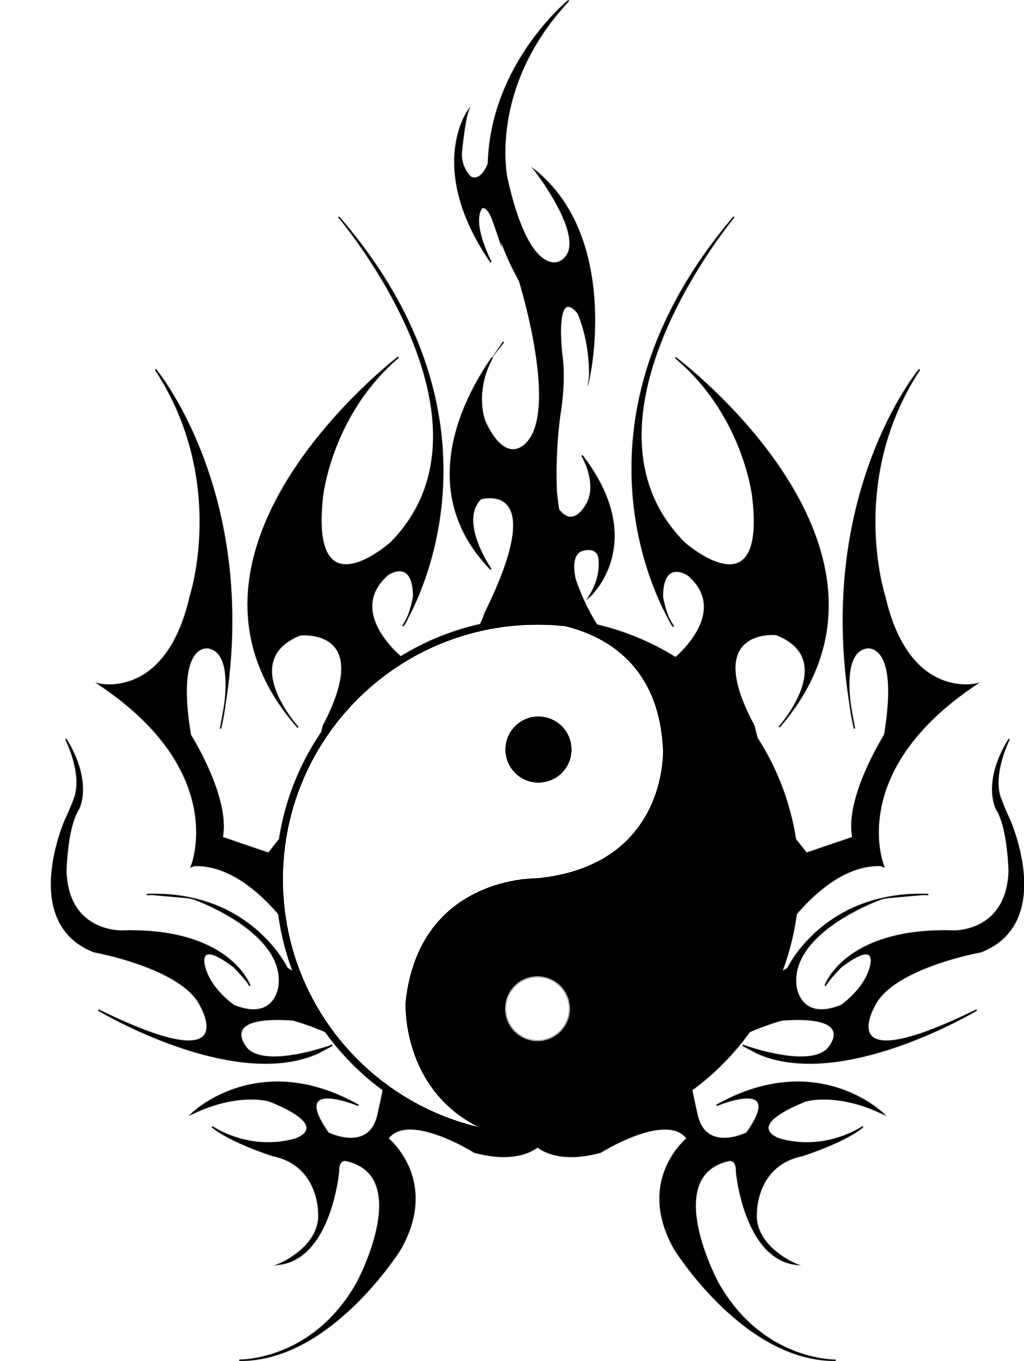 14 Yin Yang Tattoo